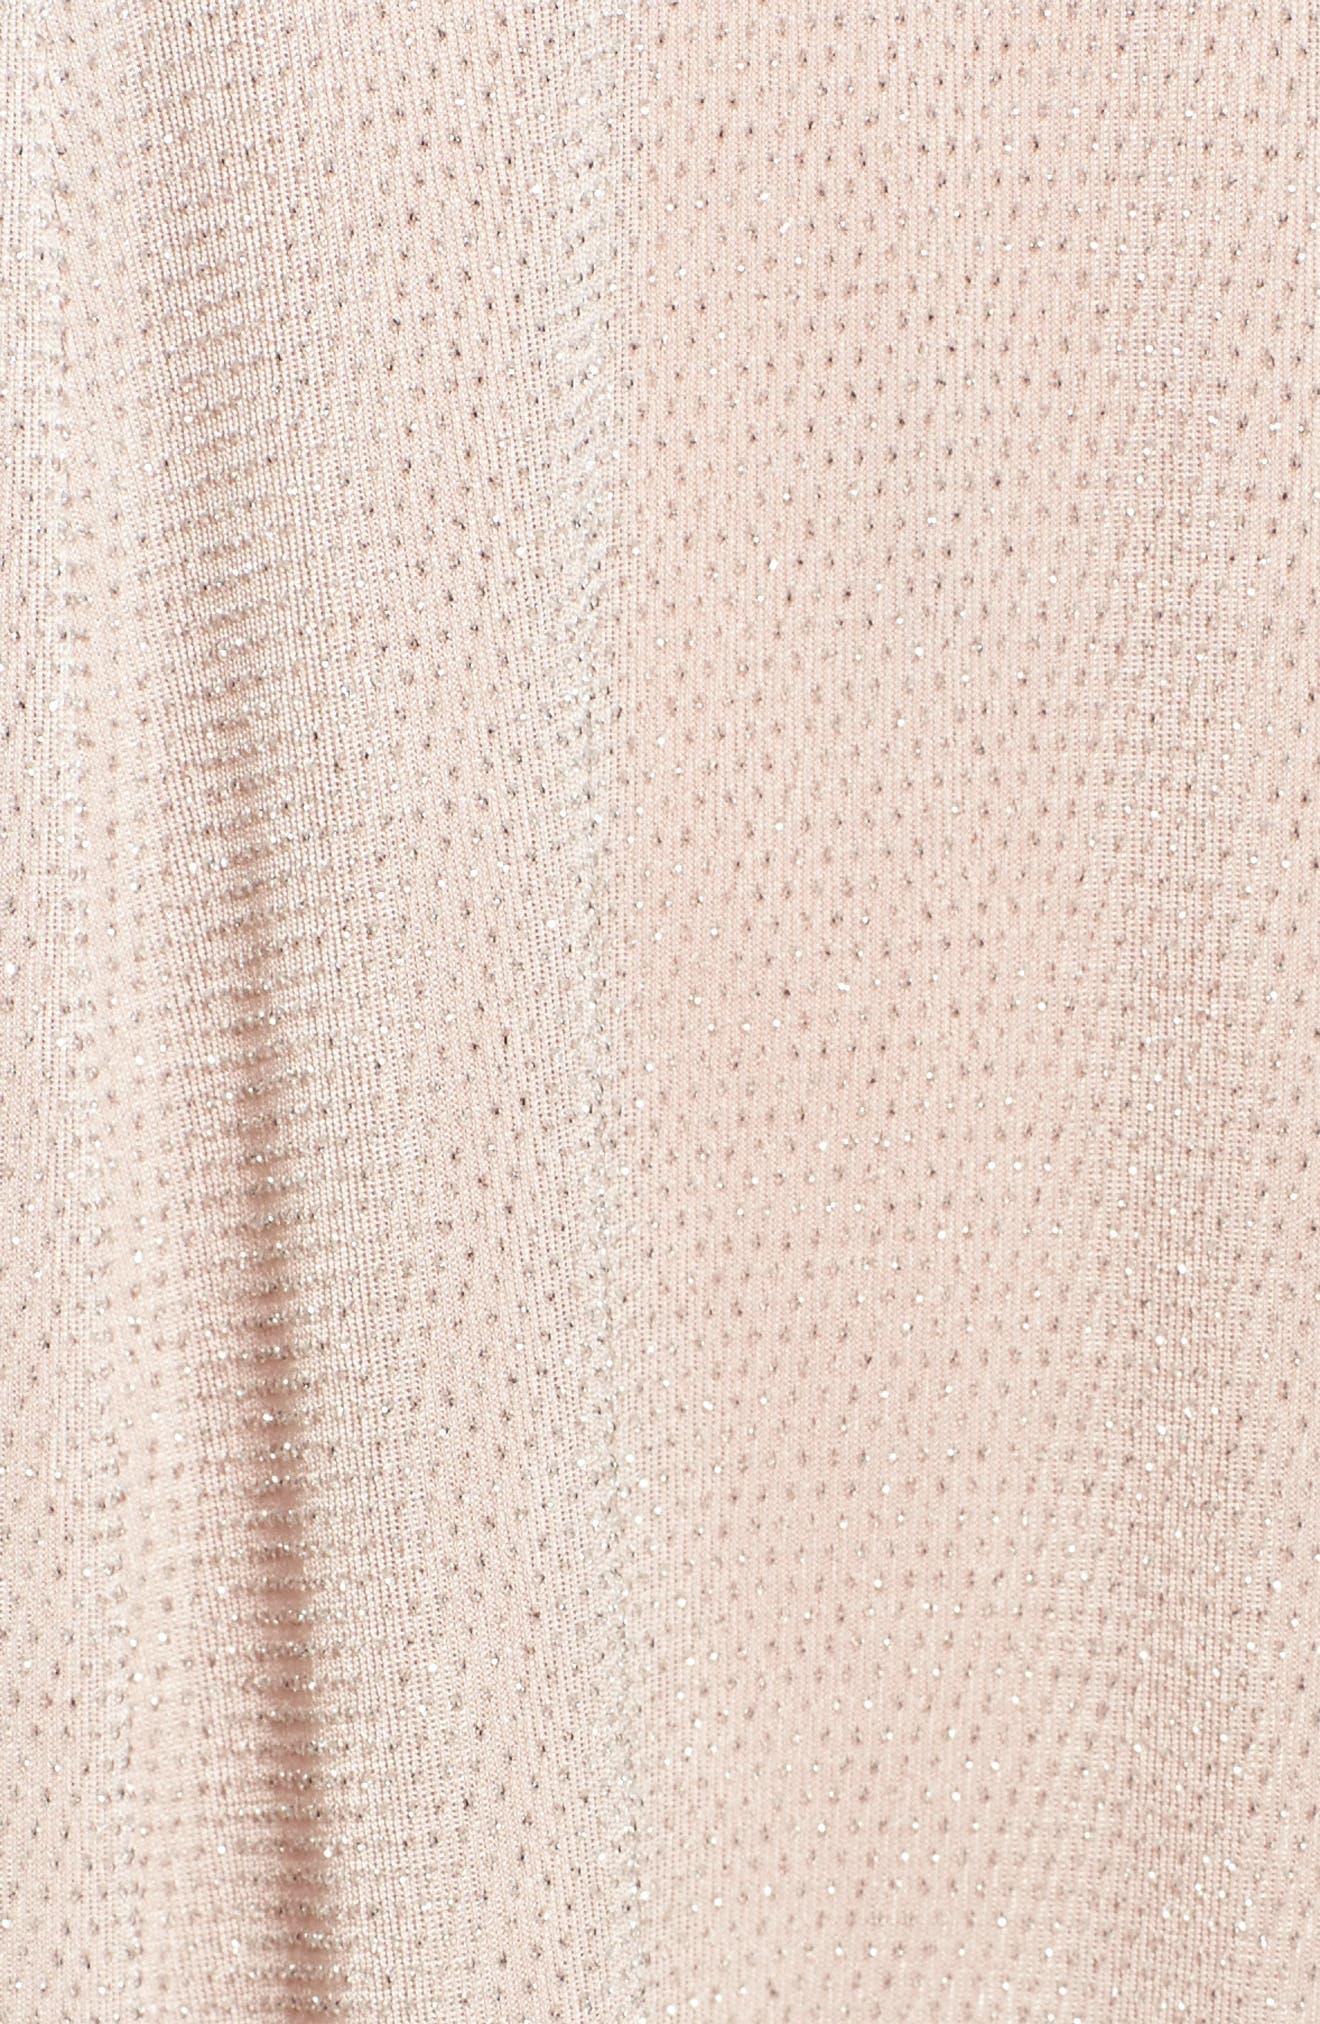 Daphne Ruffle Minidress,                             Alternate thumbnail 5, color,                             Dancing Queen Shine Blush